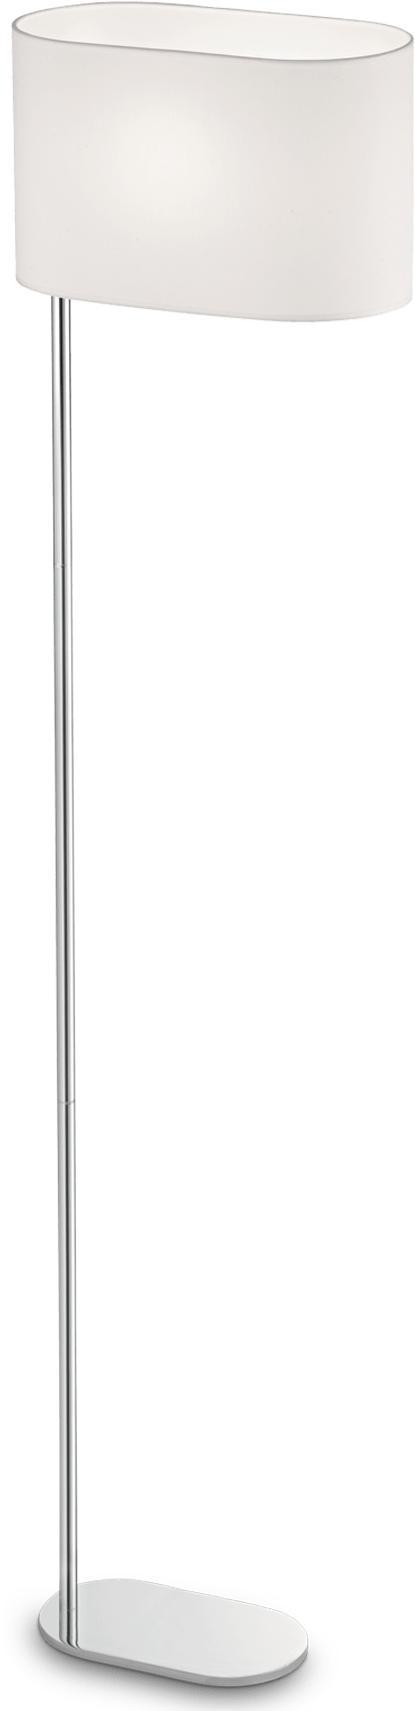 Ideal lux LED Sheraton bianco Lampe stehende 5W 74931